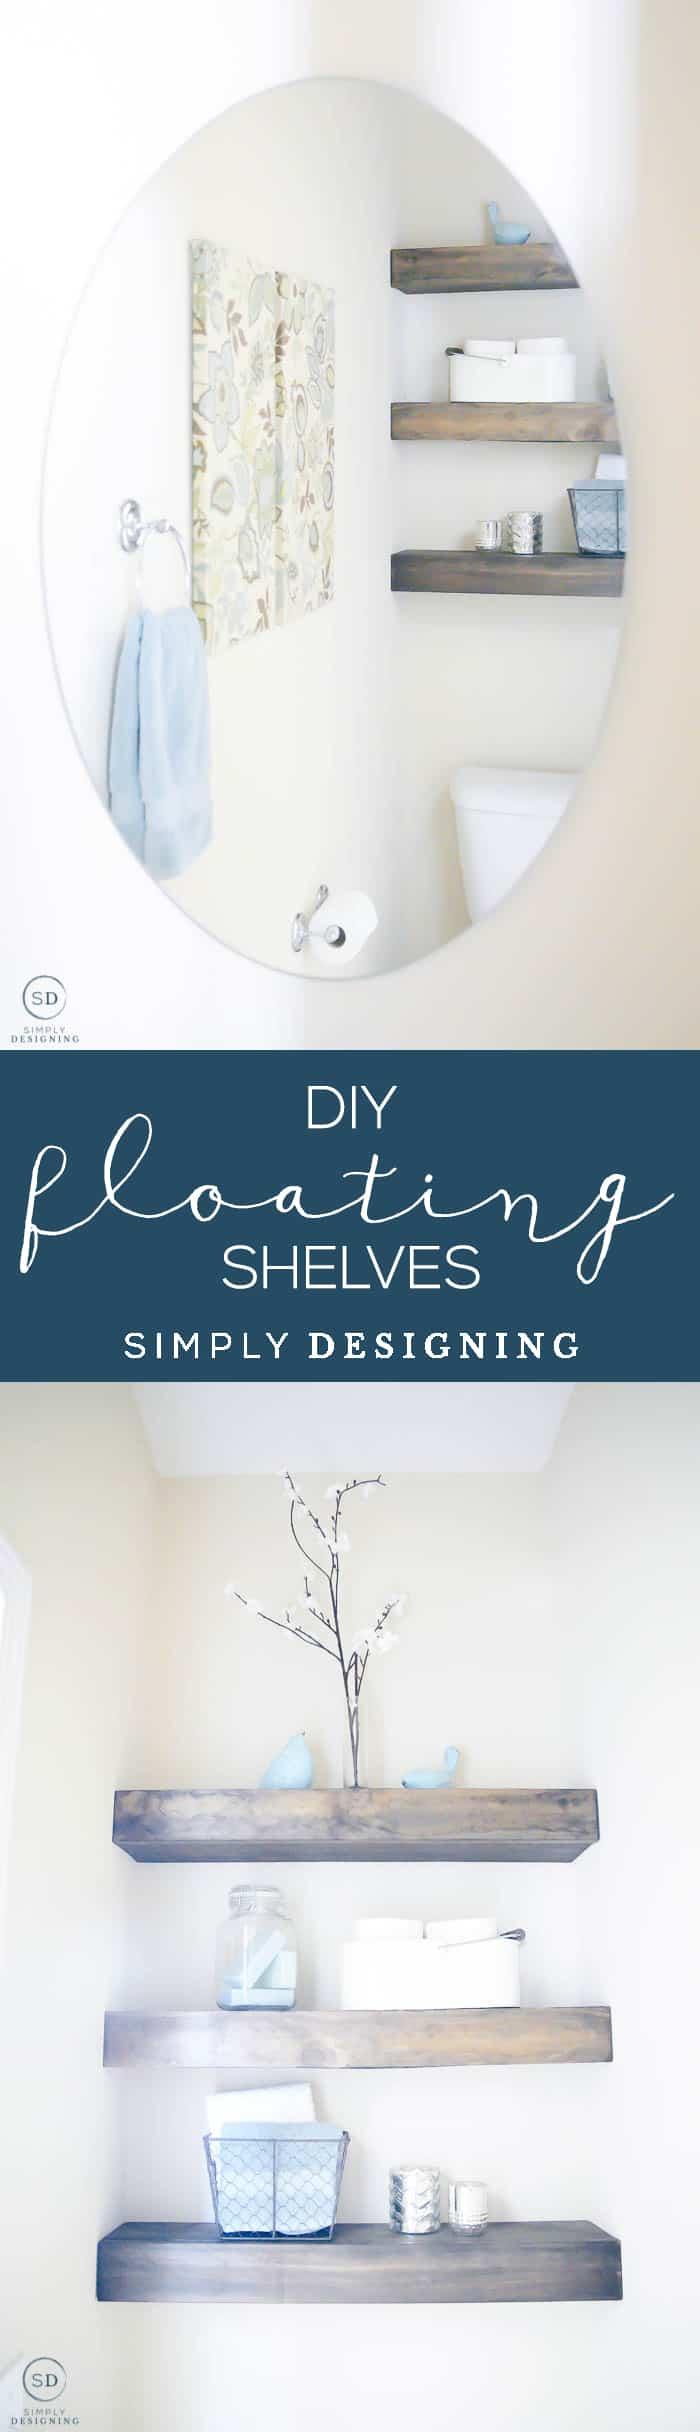 DIY Floating Shelves - sharing all the steps for how to make floating shelves